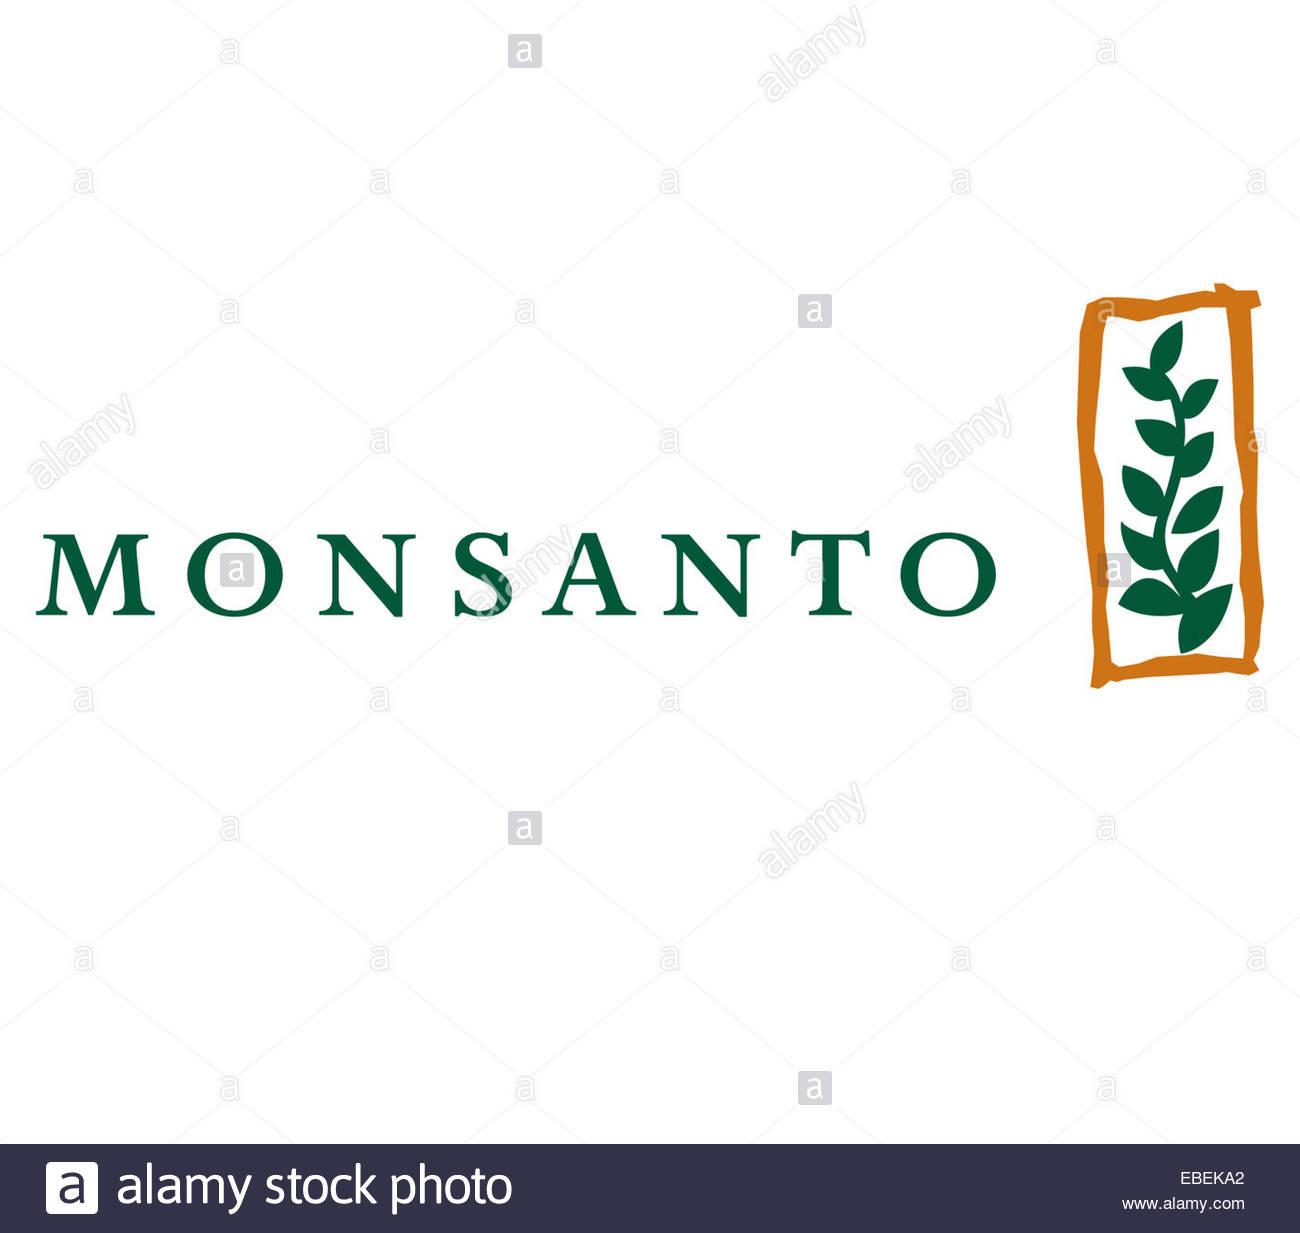 Monsanto logo icon sign - Stock Image